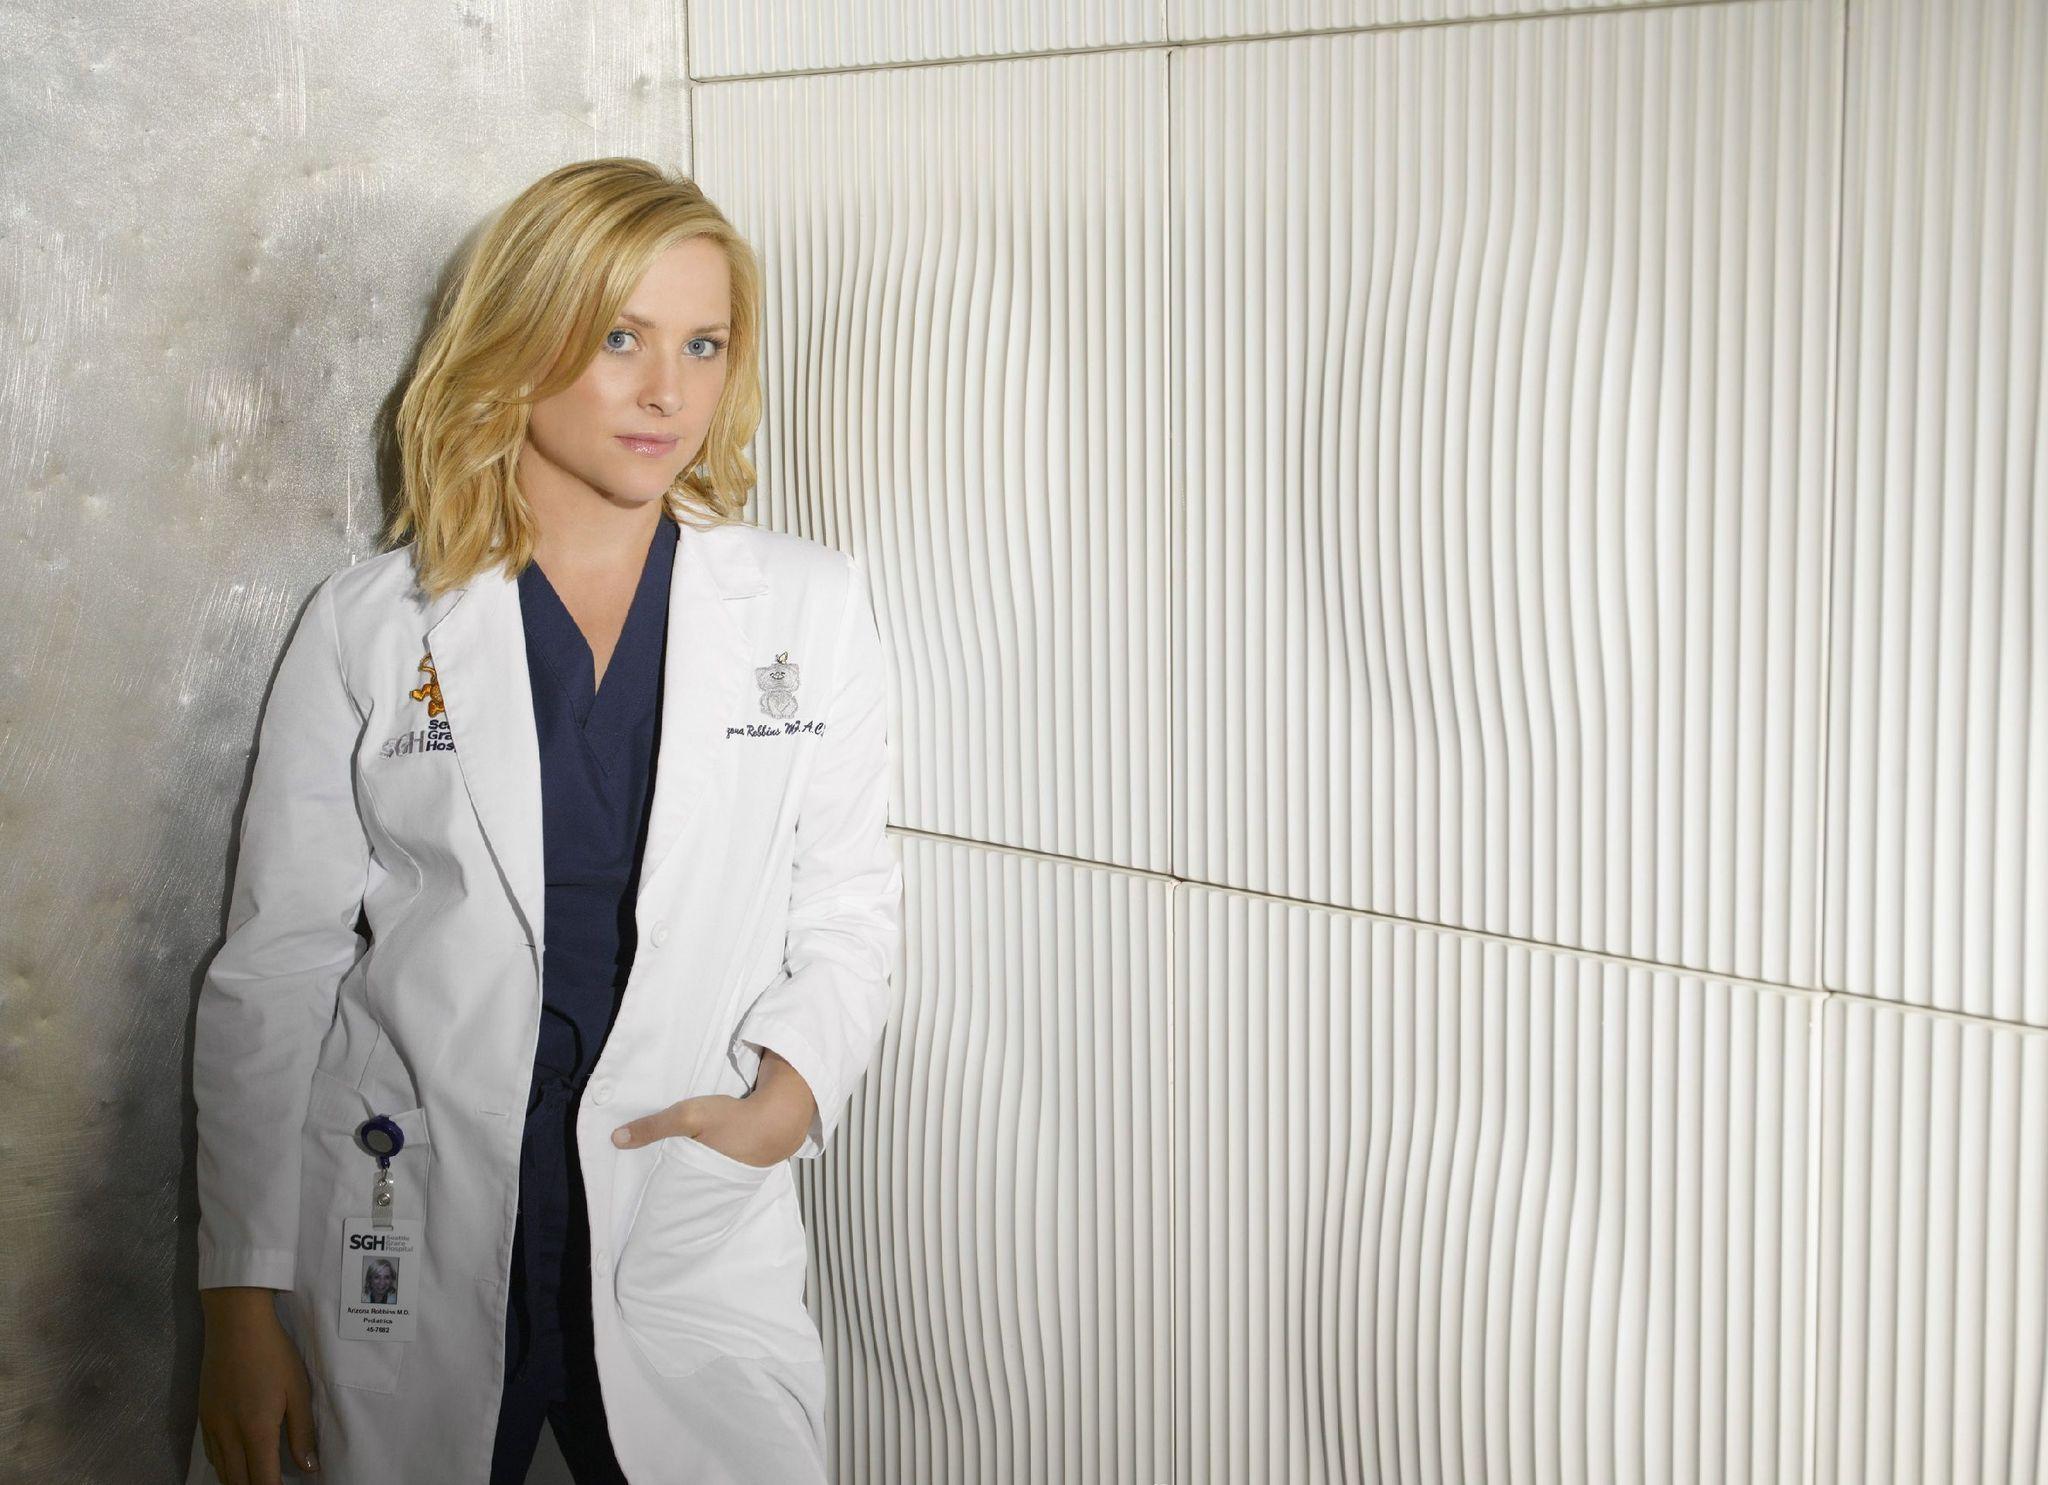 Grey\'s Anatomy - Season 6 Promo | Grey\'s Anatomy | Pinterest